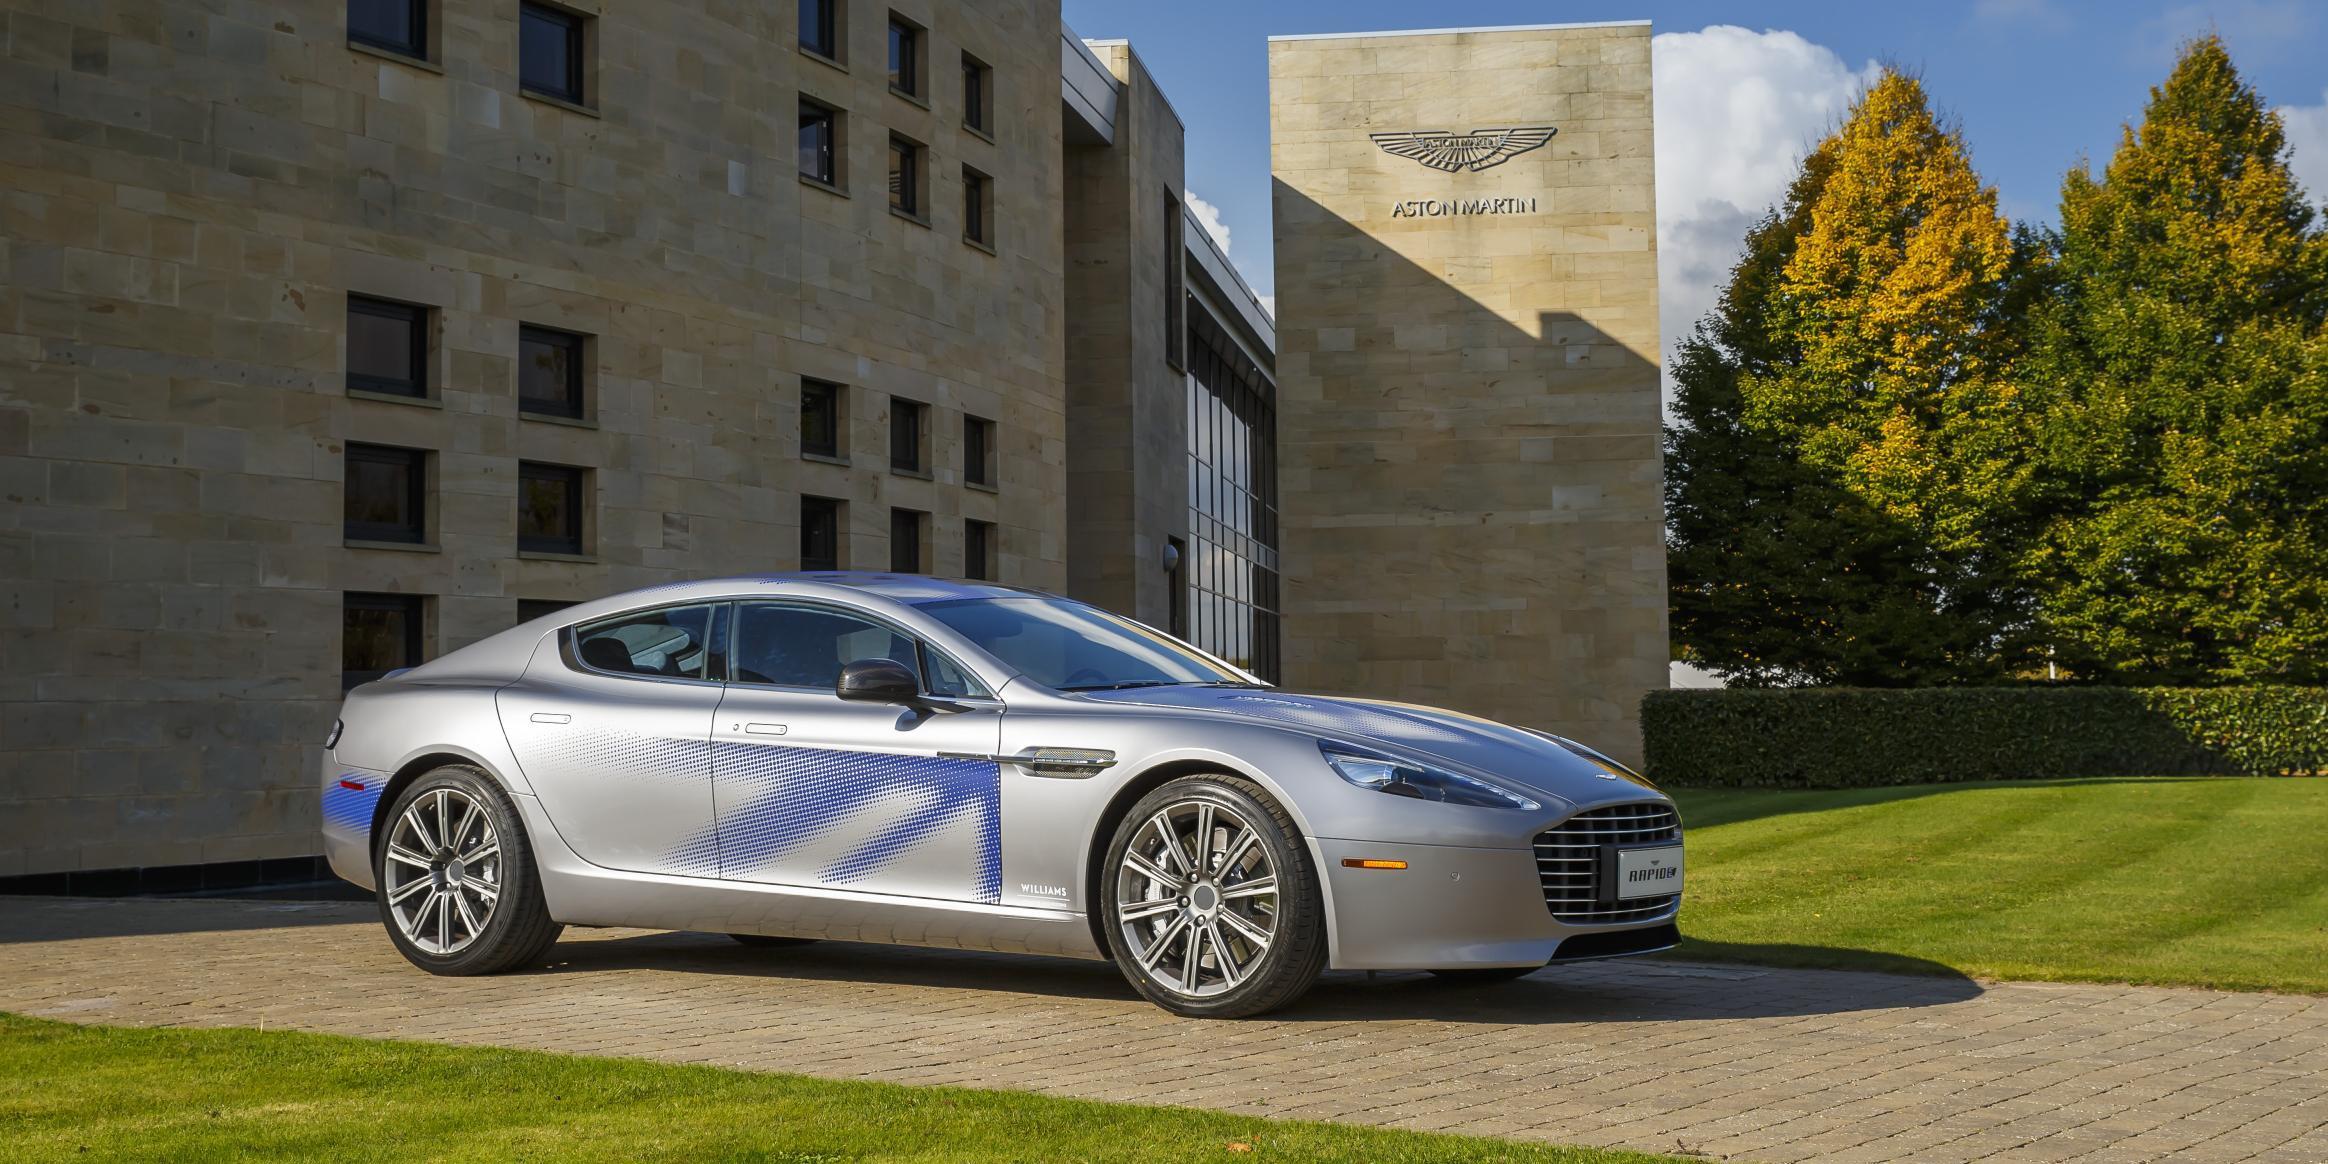 James Bond's next car will be the all-electric Aston Martin Rapide E